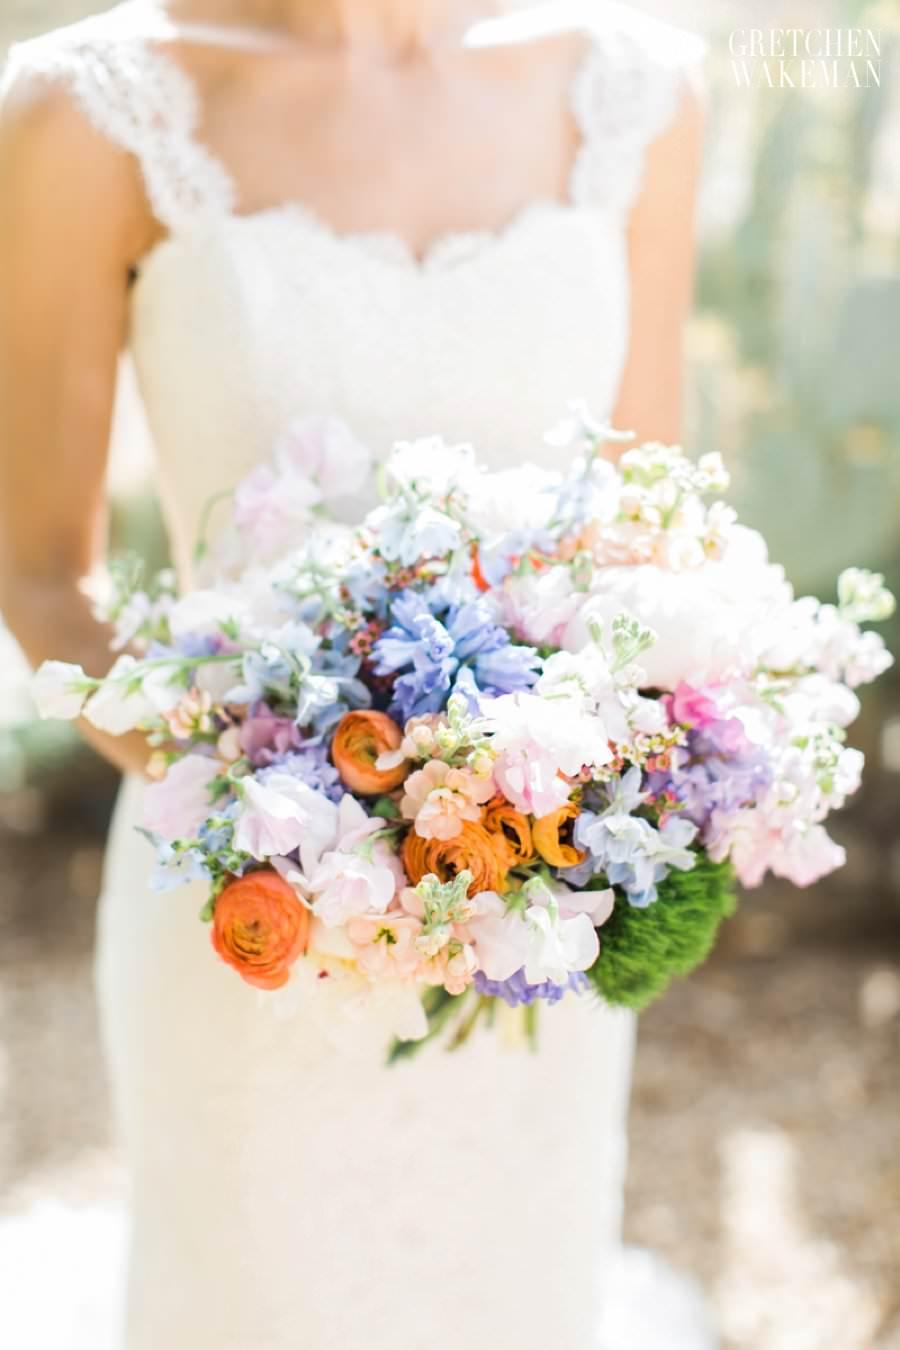 HERMOSA INN WEDDING-041_GRETCHEN WAKEMAN PHOTOGRAPHY.jpg